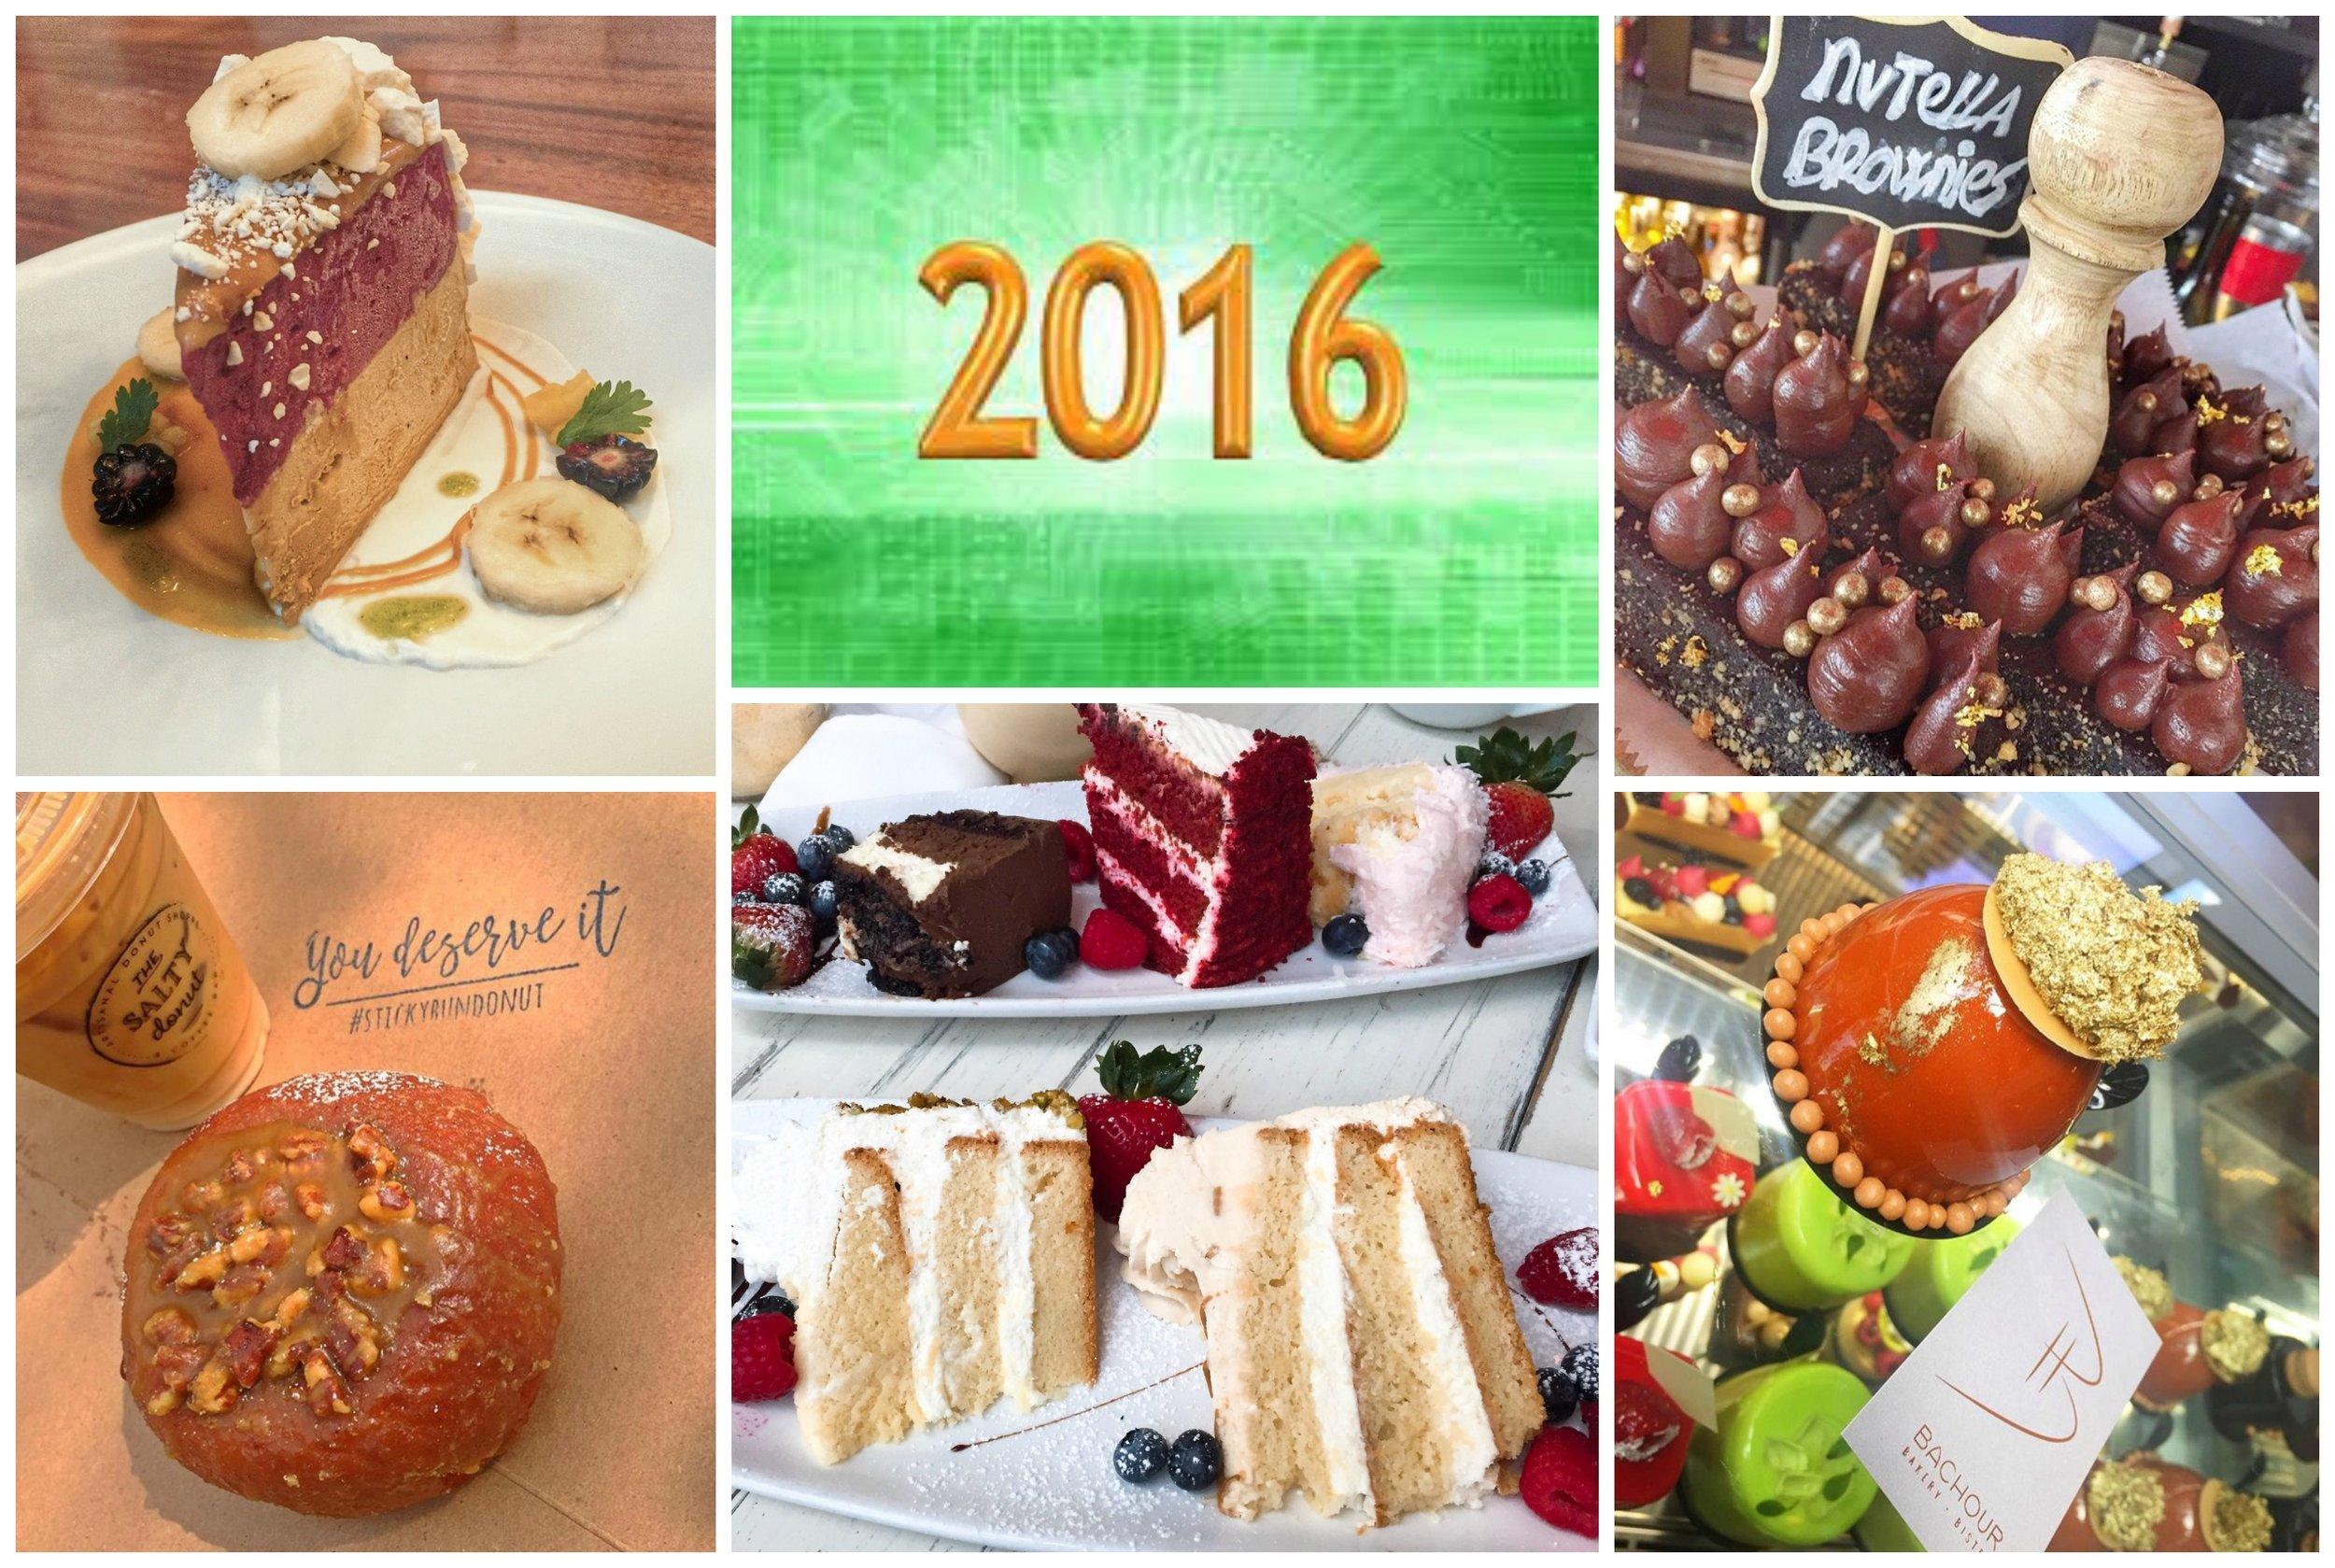 Best Desserts in Miami; 2016 Saturday Sweets